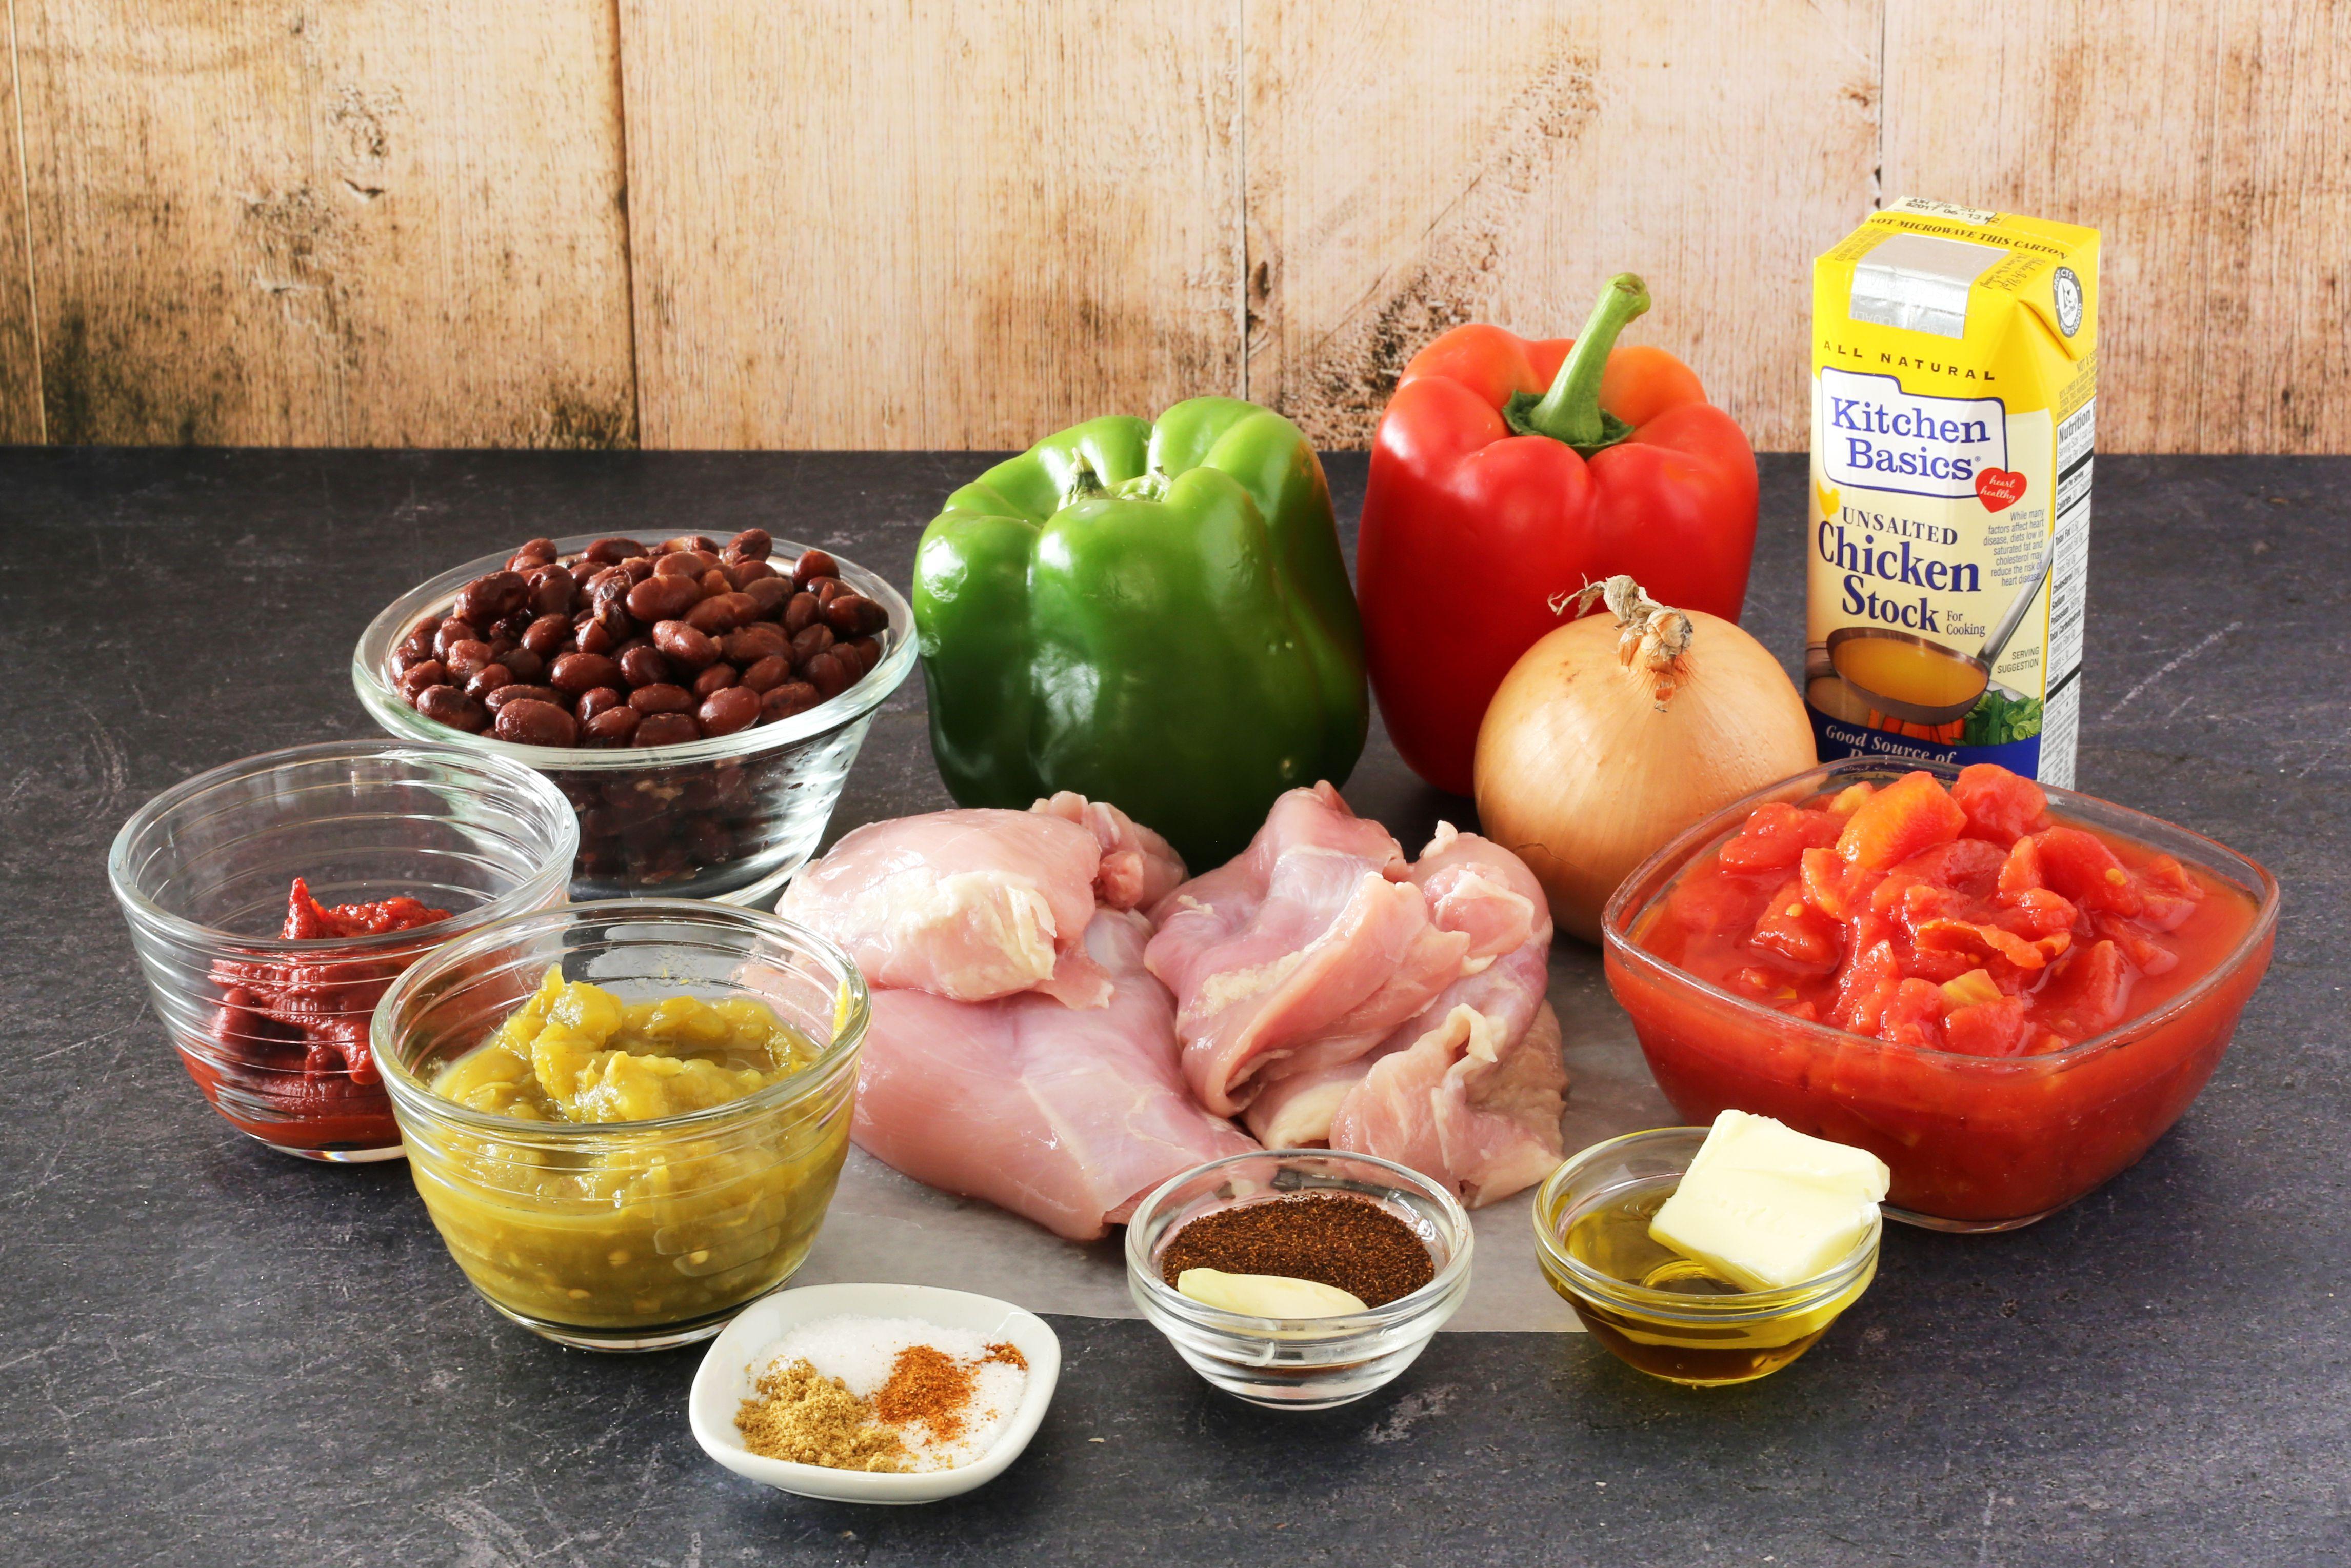 Ingredients for chicken chili.